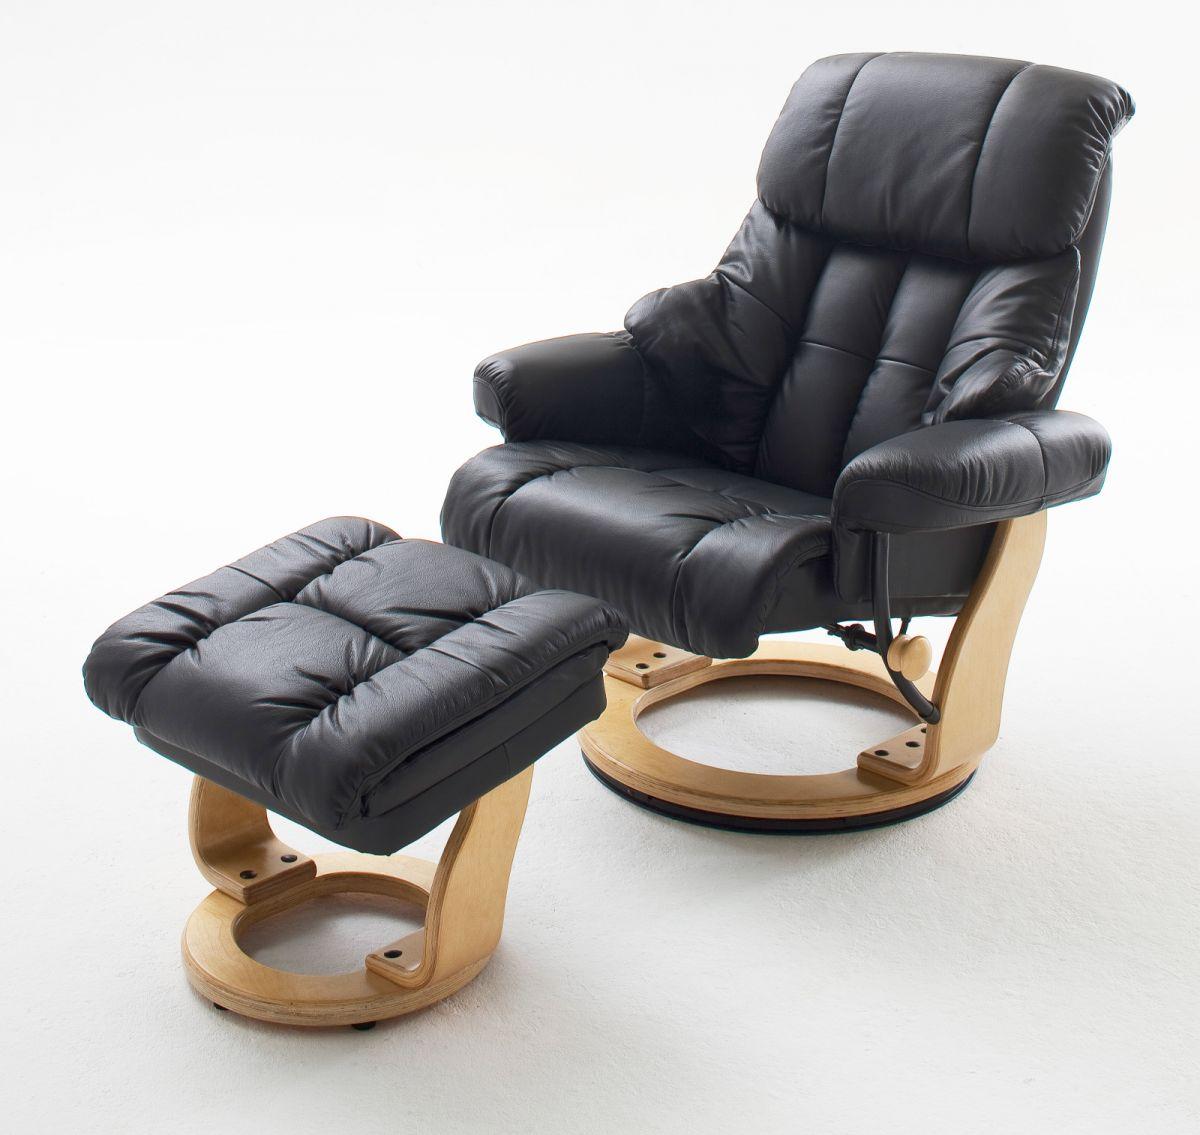 Relaxsessel Calgary schwarz Leder mit Hocker